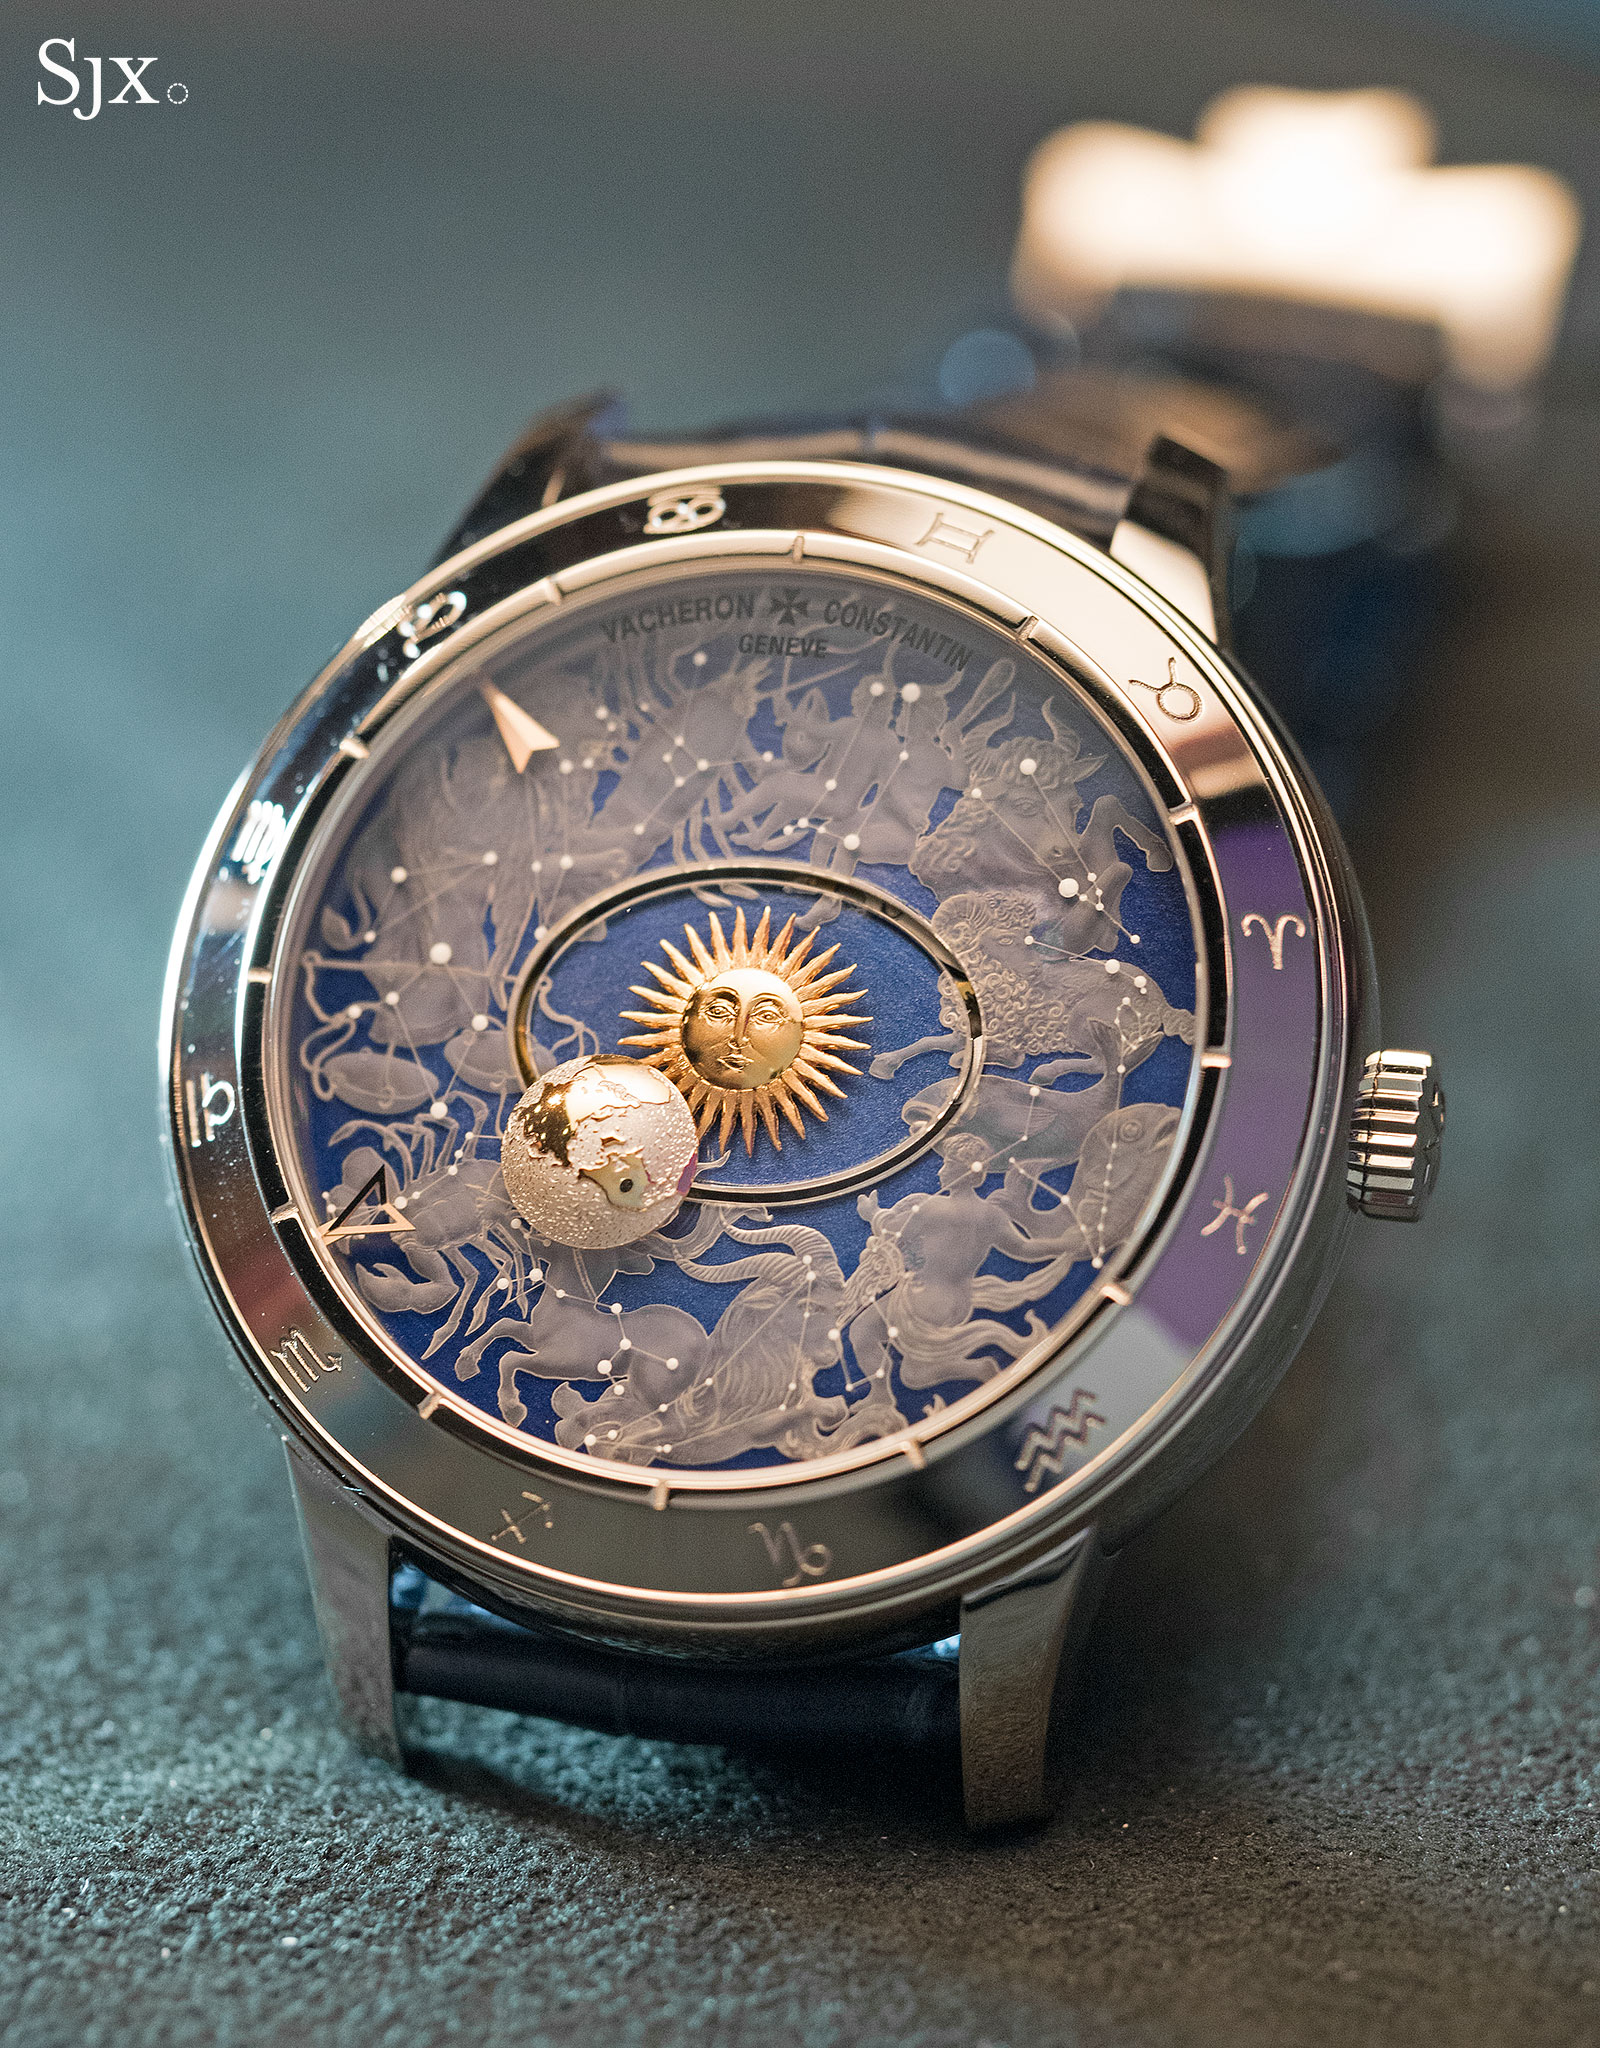 Vacheron Constantin Copernicus sapphire 1